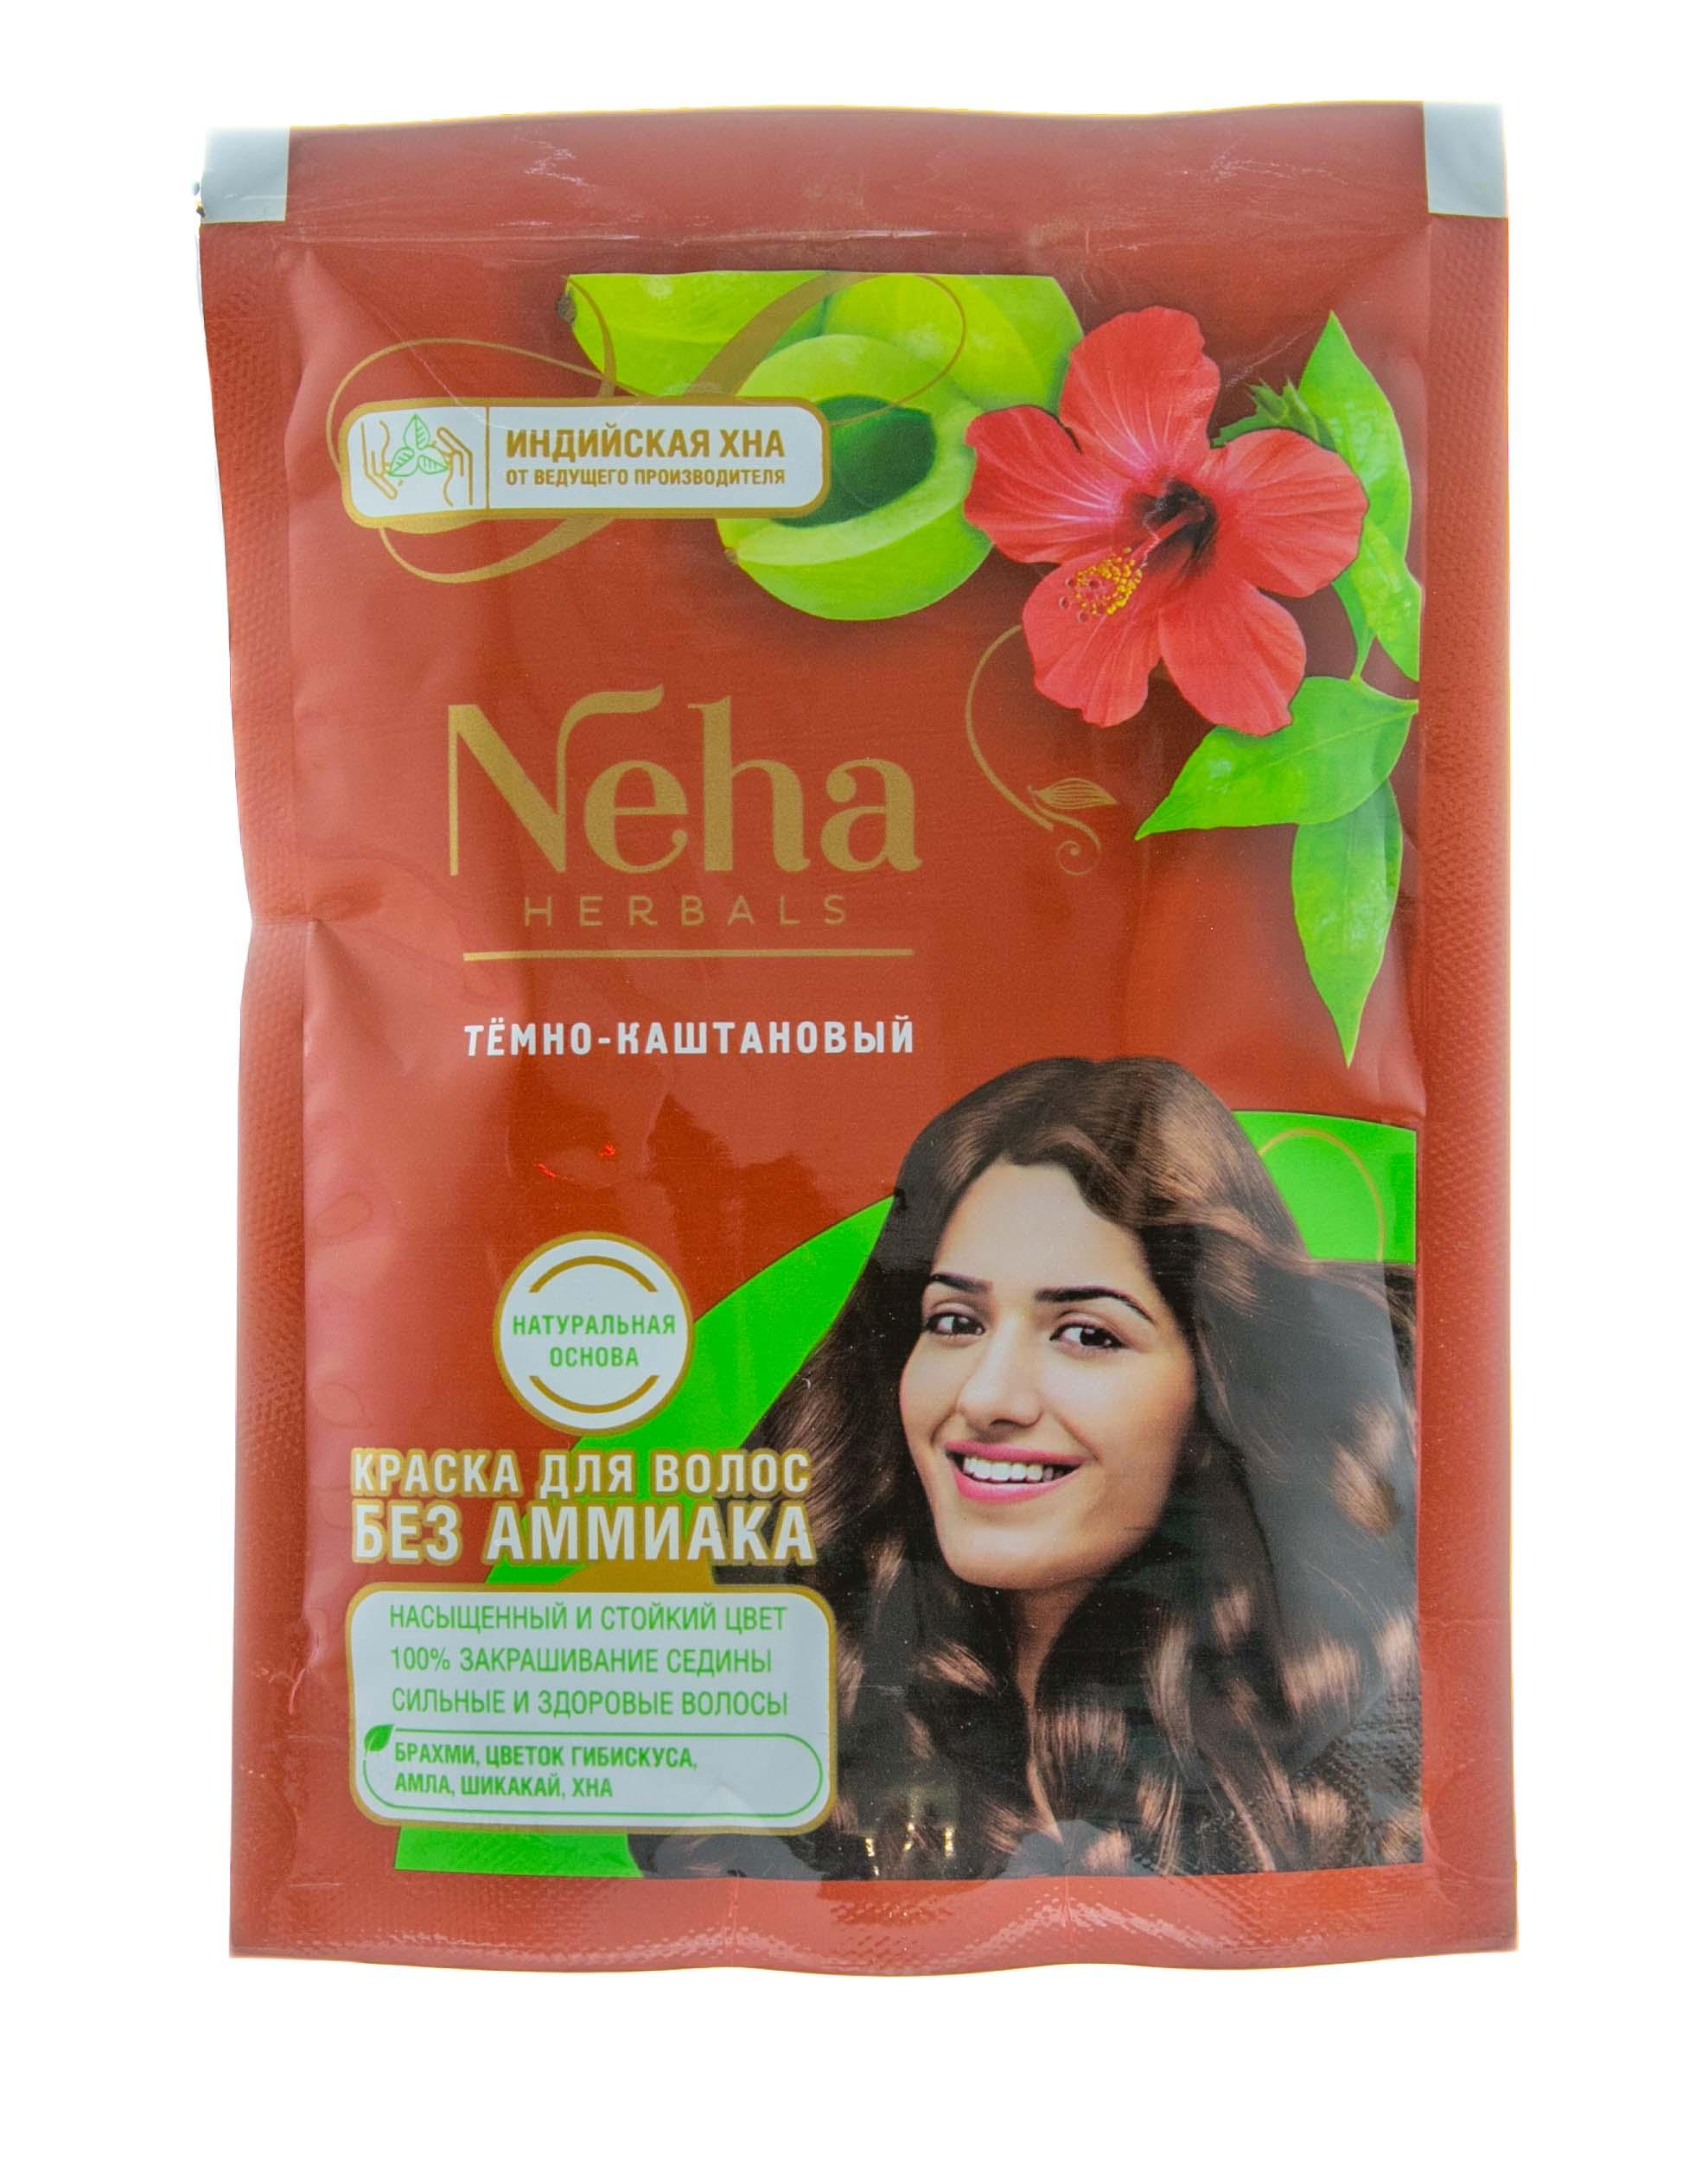 Купить Himalaya Herbals Краска для волос без аммиака Neha Herbals, 55 г (Himalaya Herbals, )